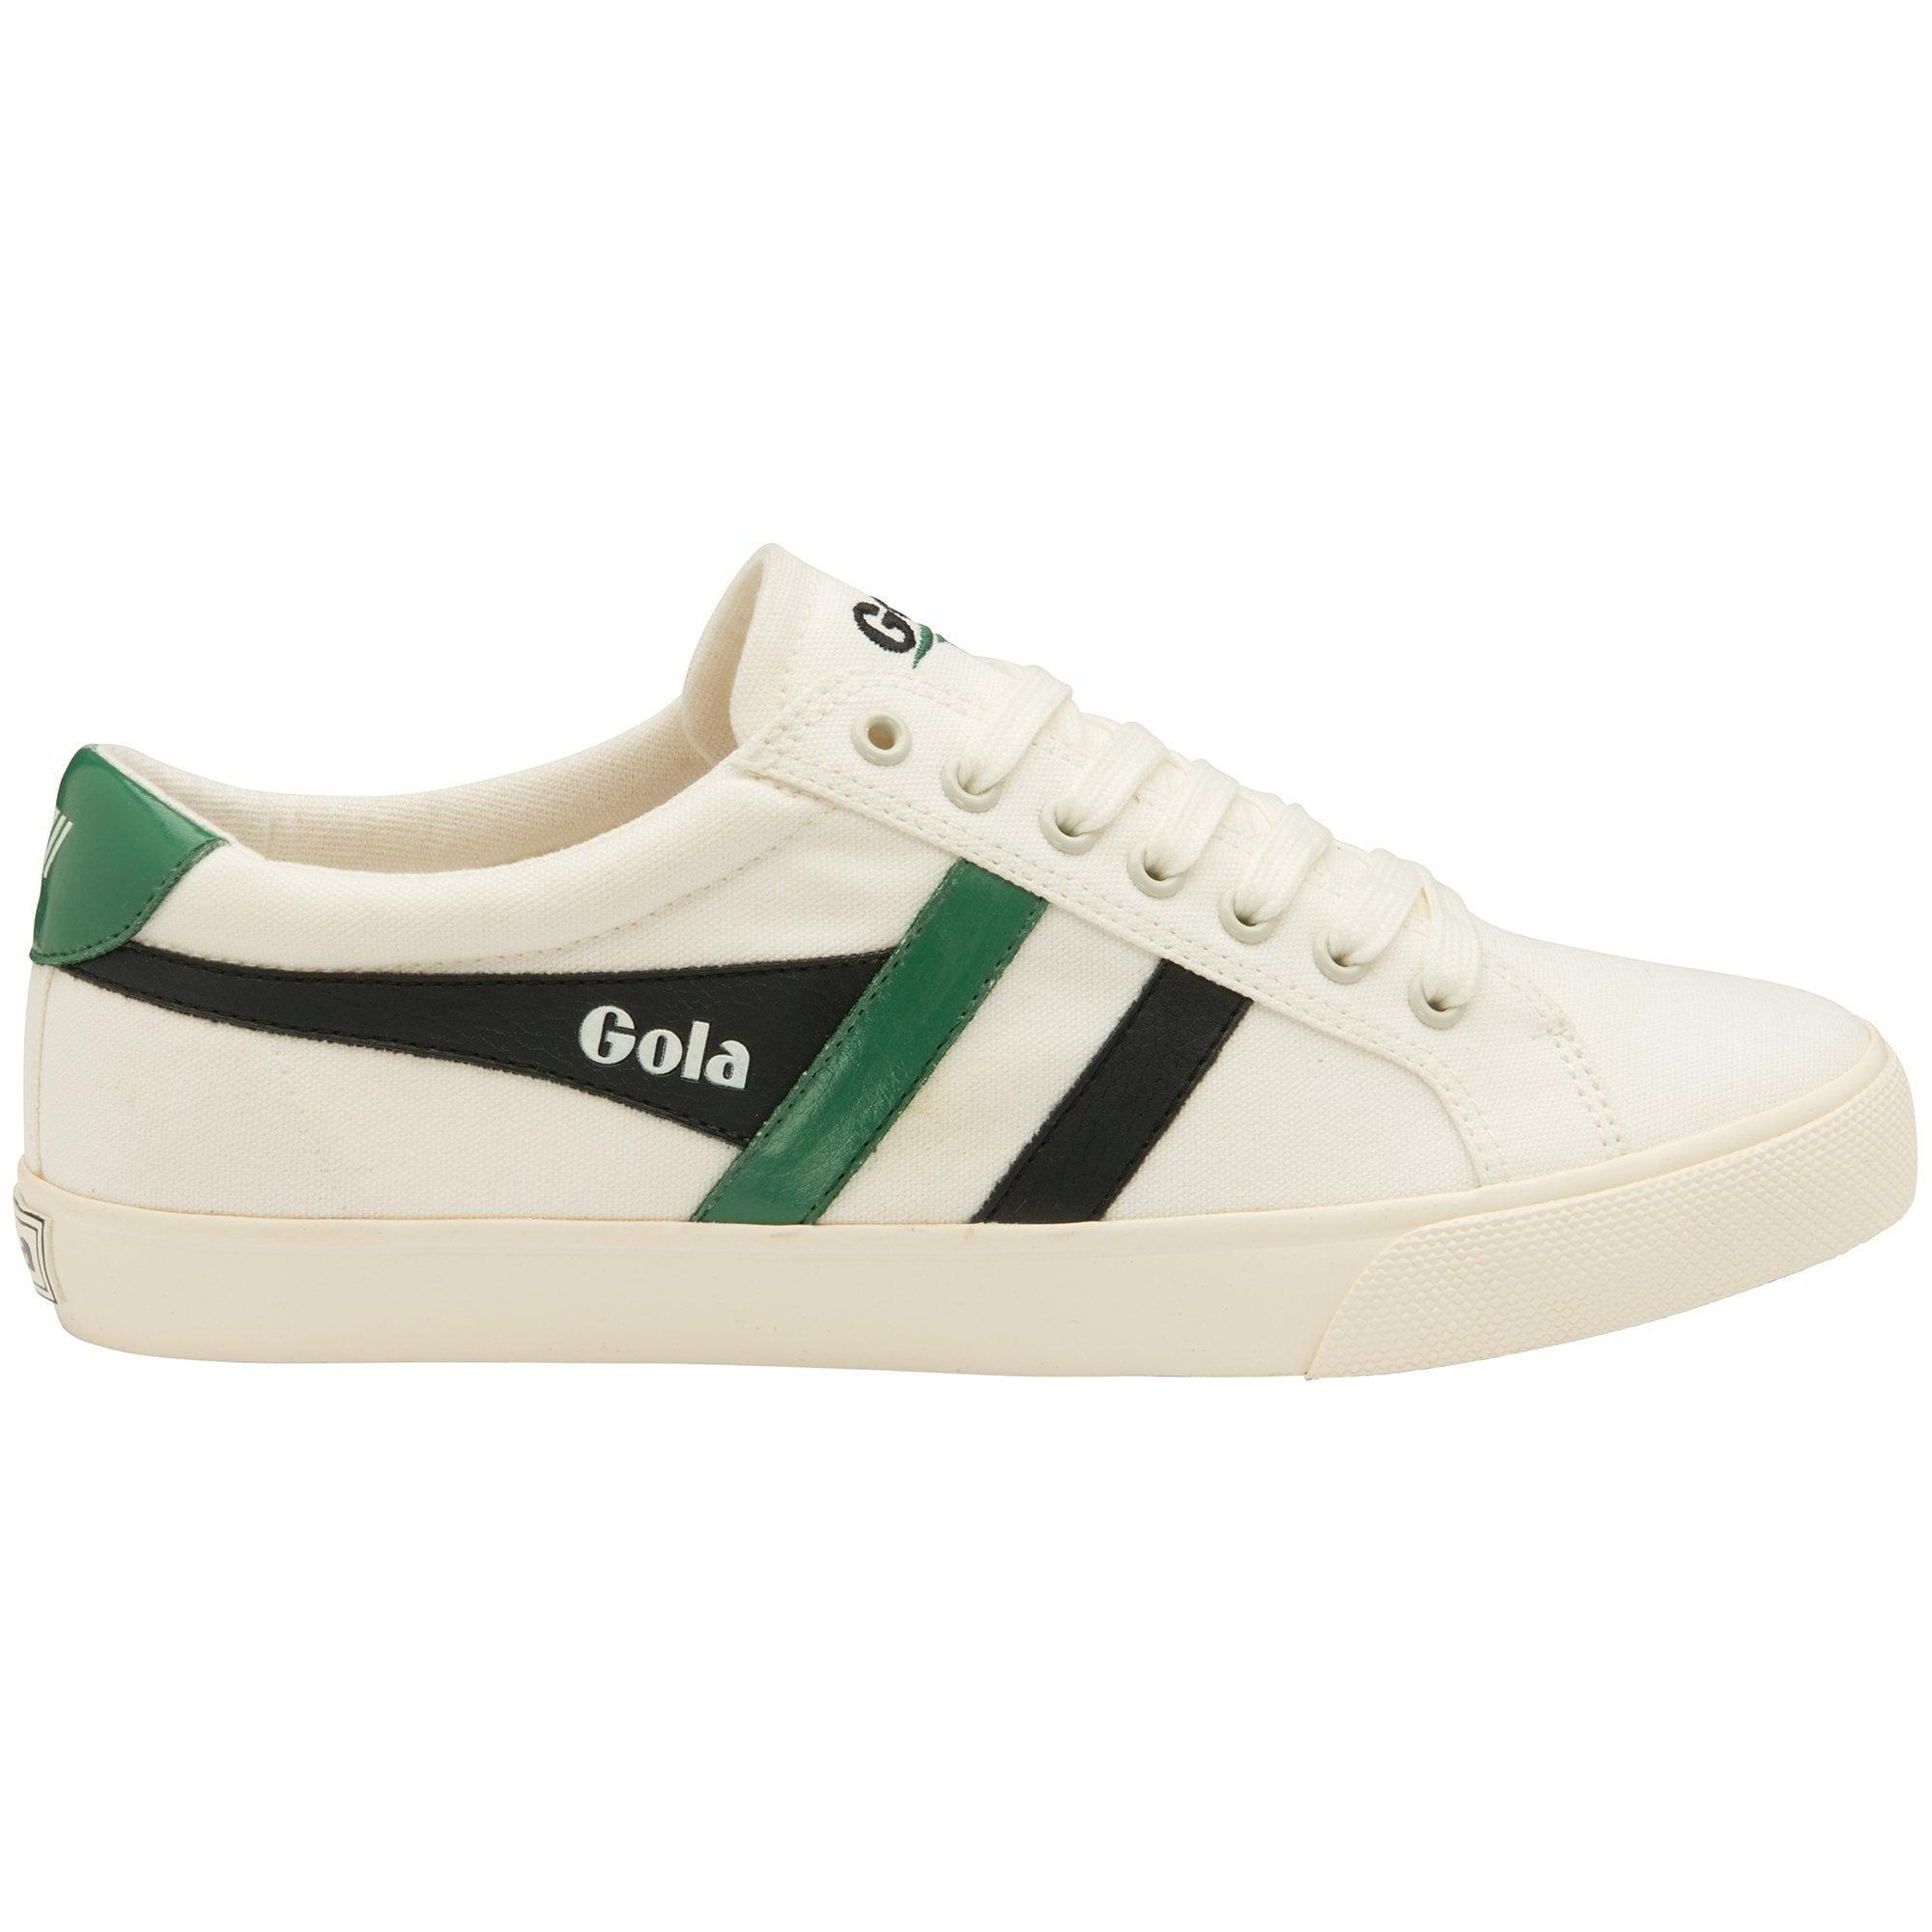 Buy Gola mens Varsity White/Black/Green